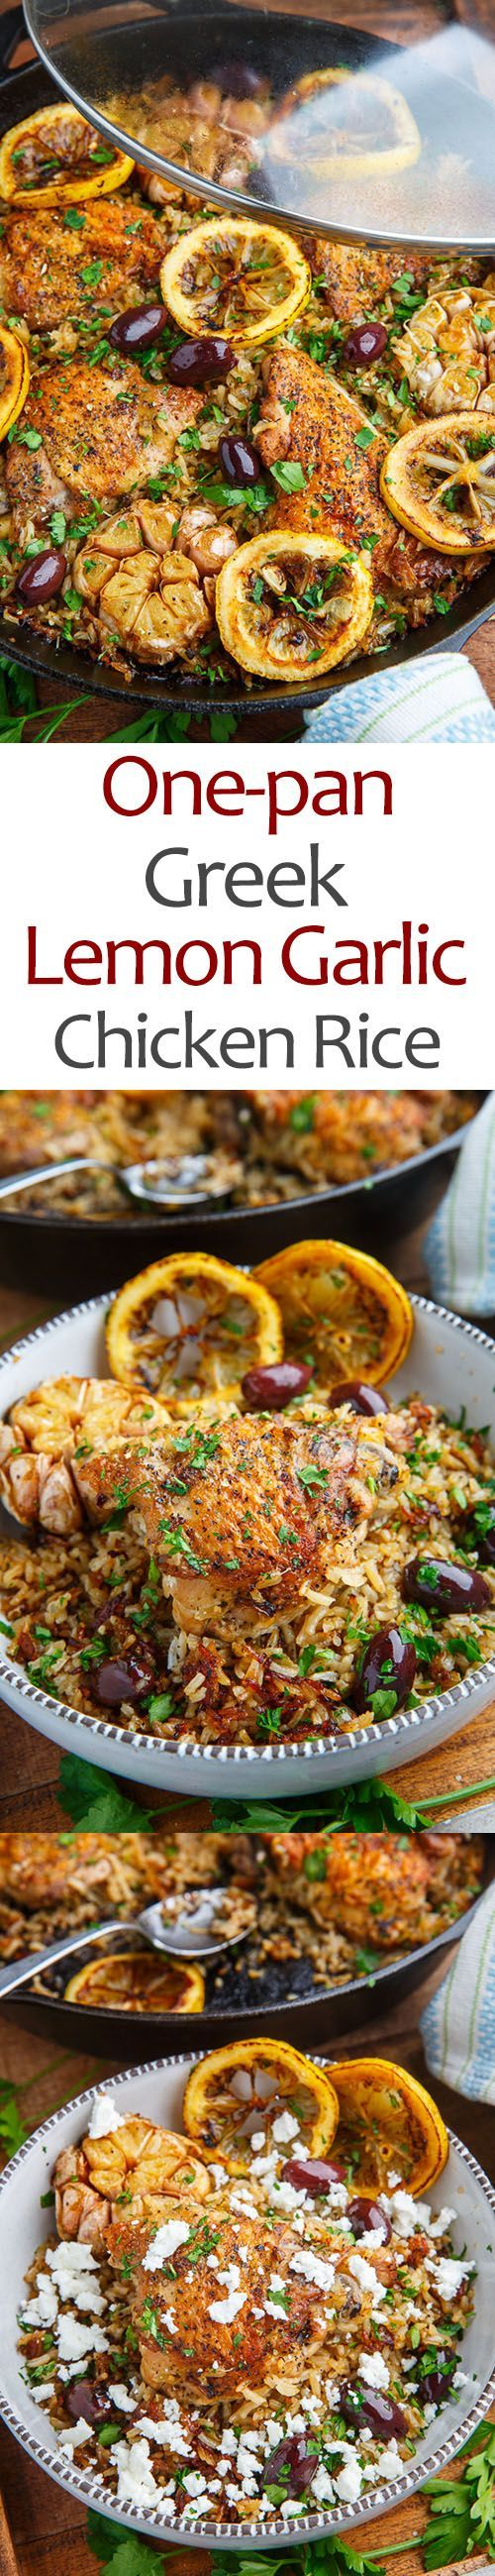 One Pan Greek Lemon Chicken (use veggie alternative)  Rice with Roast Garlic